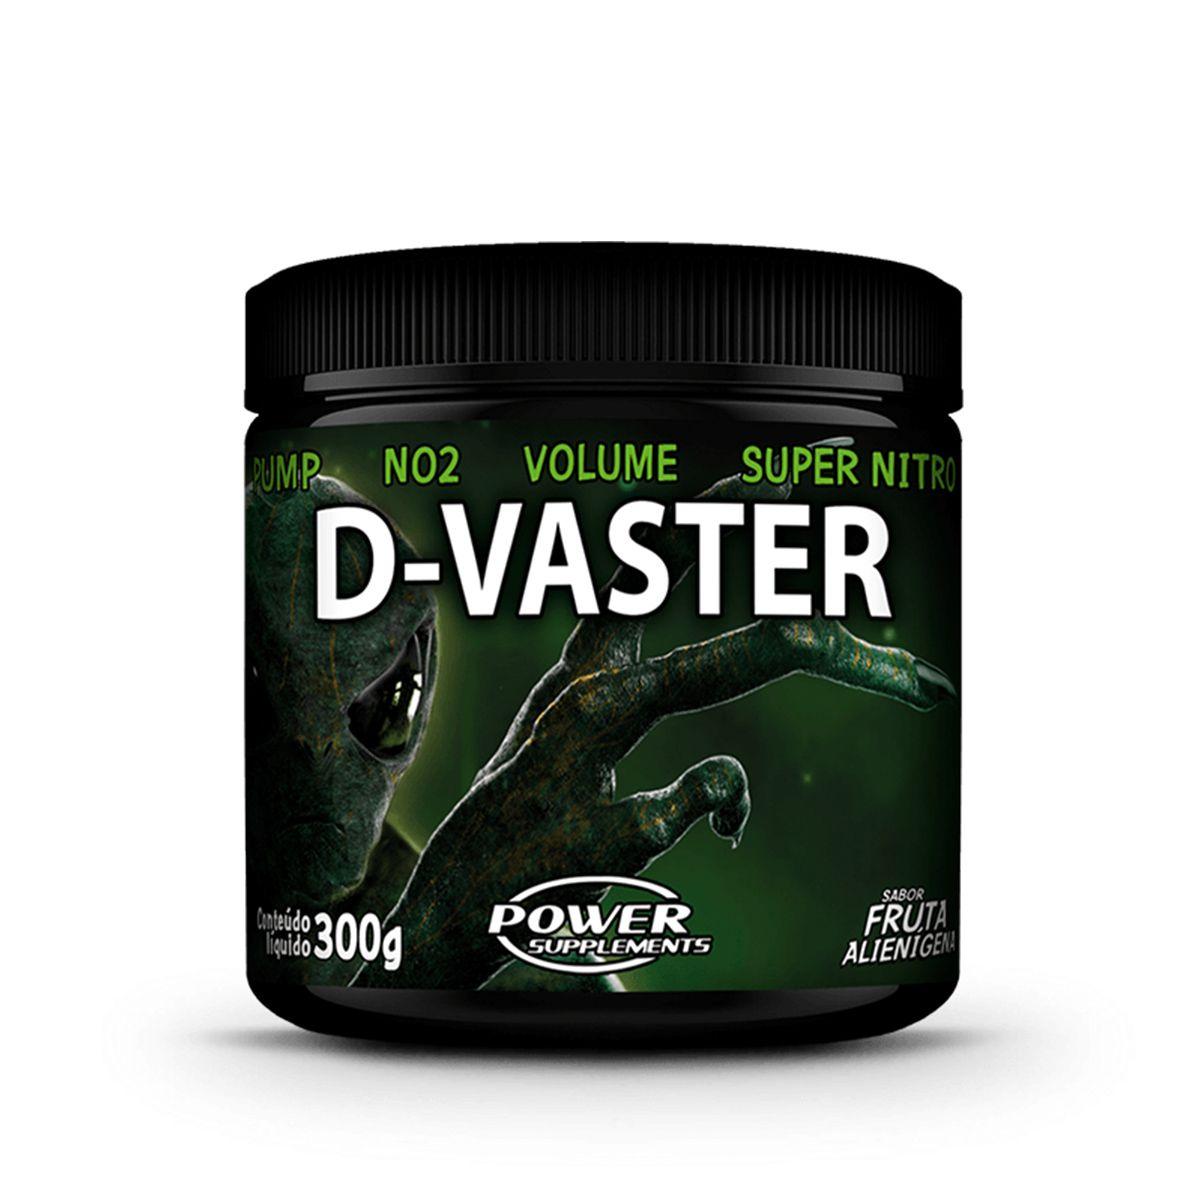 D-Vaster - 300g - Power Supplements